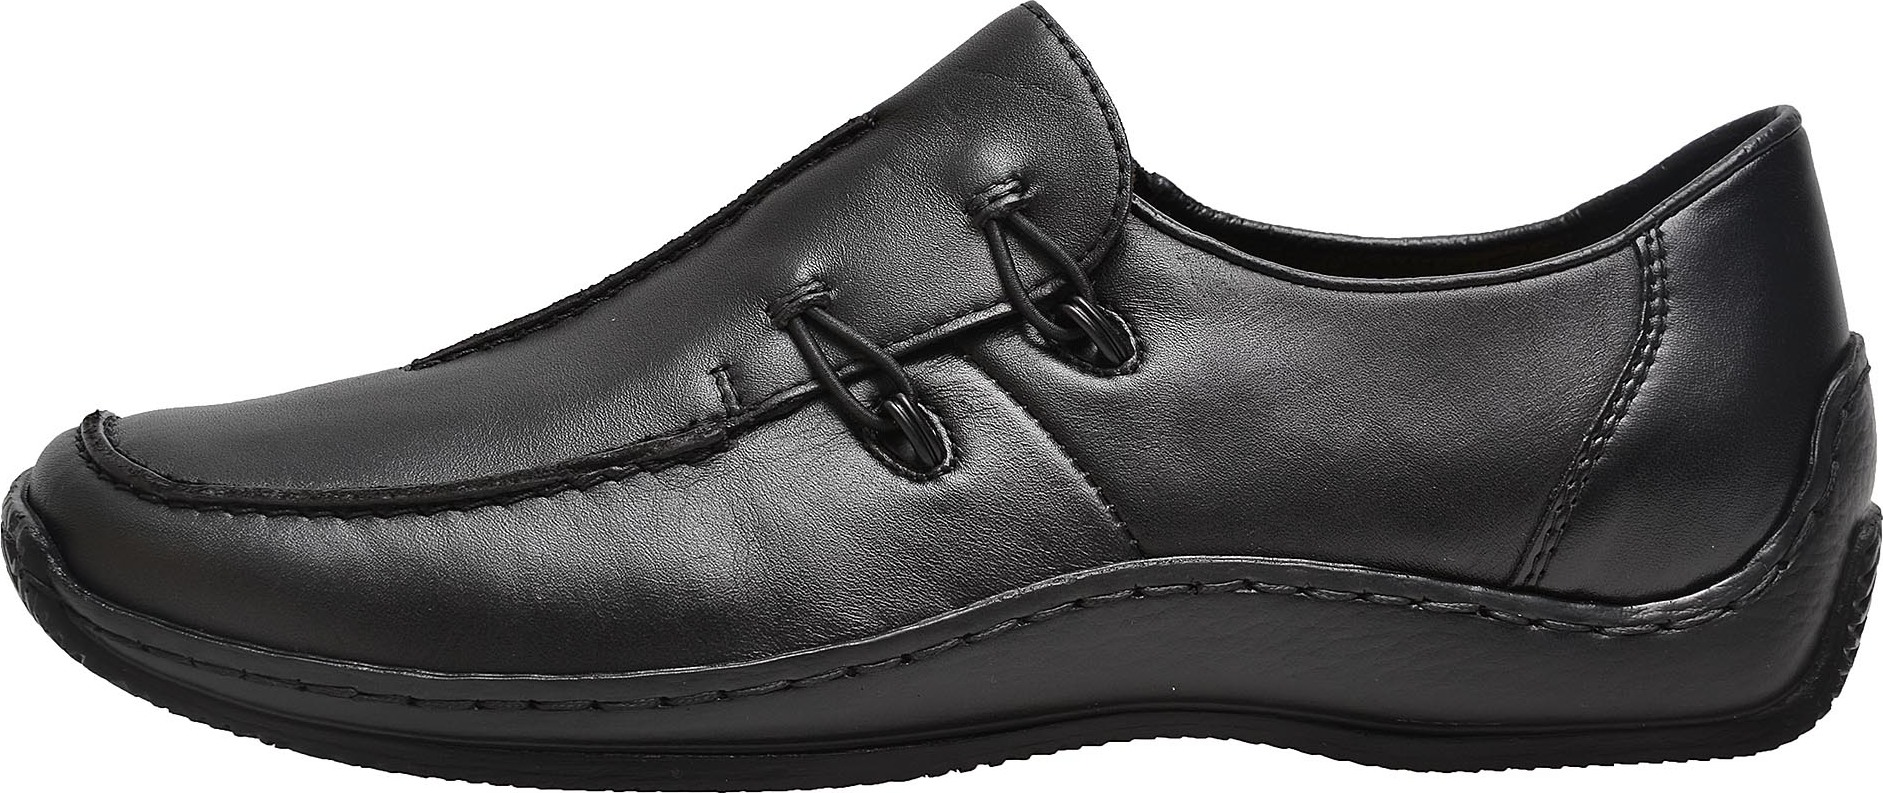 Dámská obuv RIEKER L1751 01 SCHWARZ H W 8 – Rieker Antistress c7cde4e5756